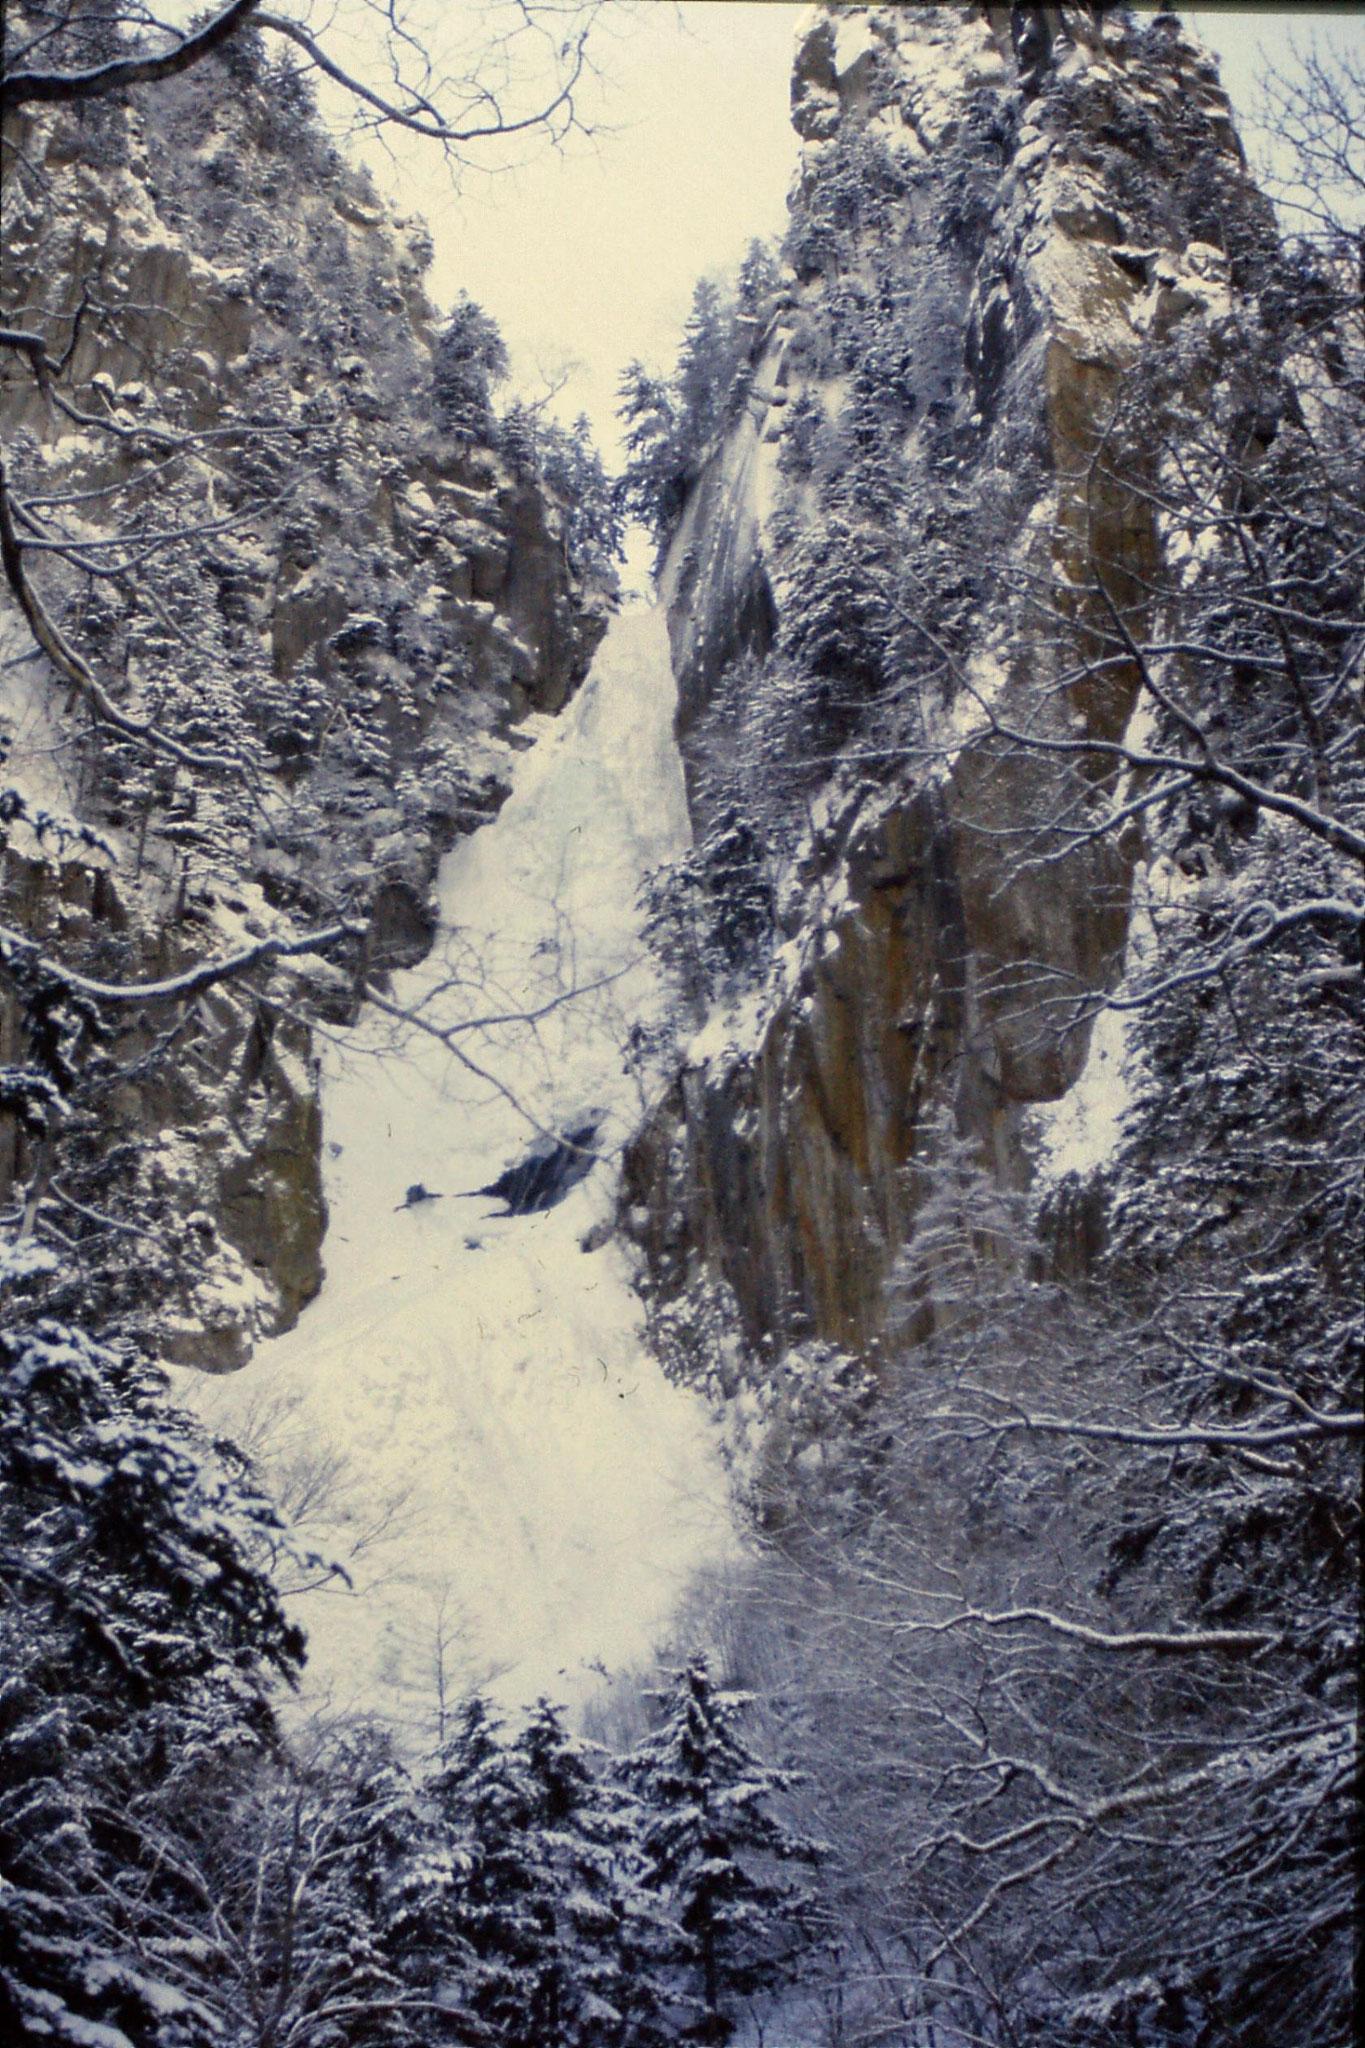 12/1/1989: 15: Sounkyo Onsen Gorge, Teusho-no-iwa